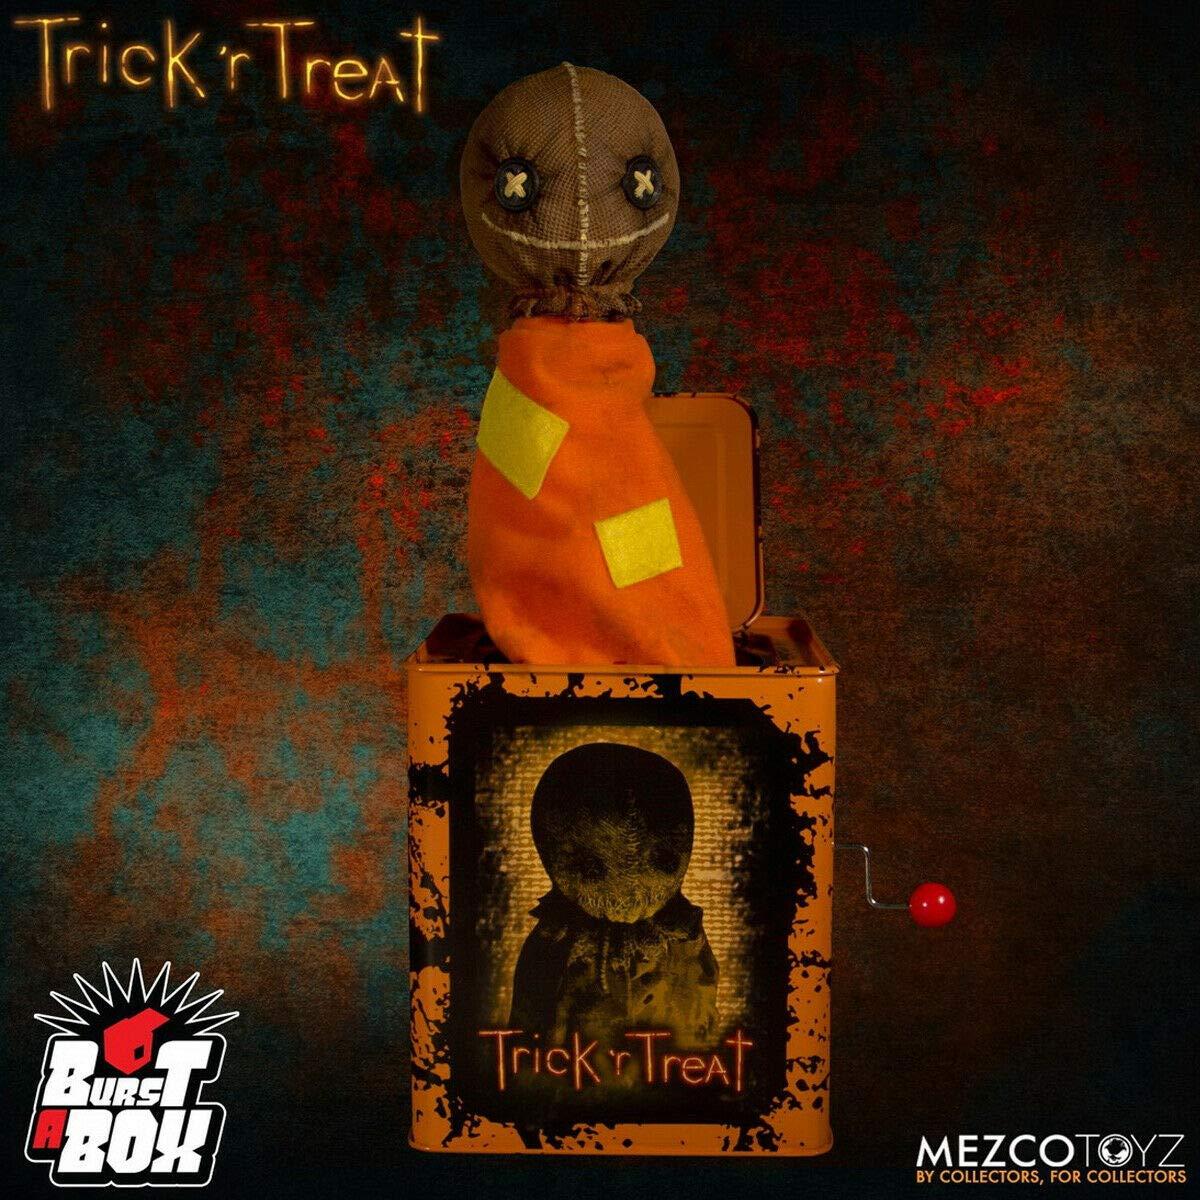 Mezco Toyz, LLC Sam Burst-a-Box Trick 'r Treat Standard by Mezco Toyz, LLC